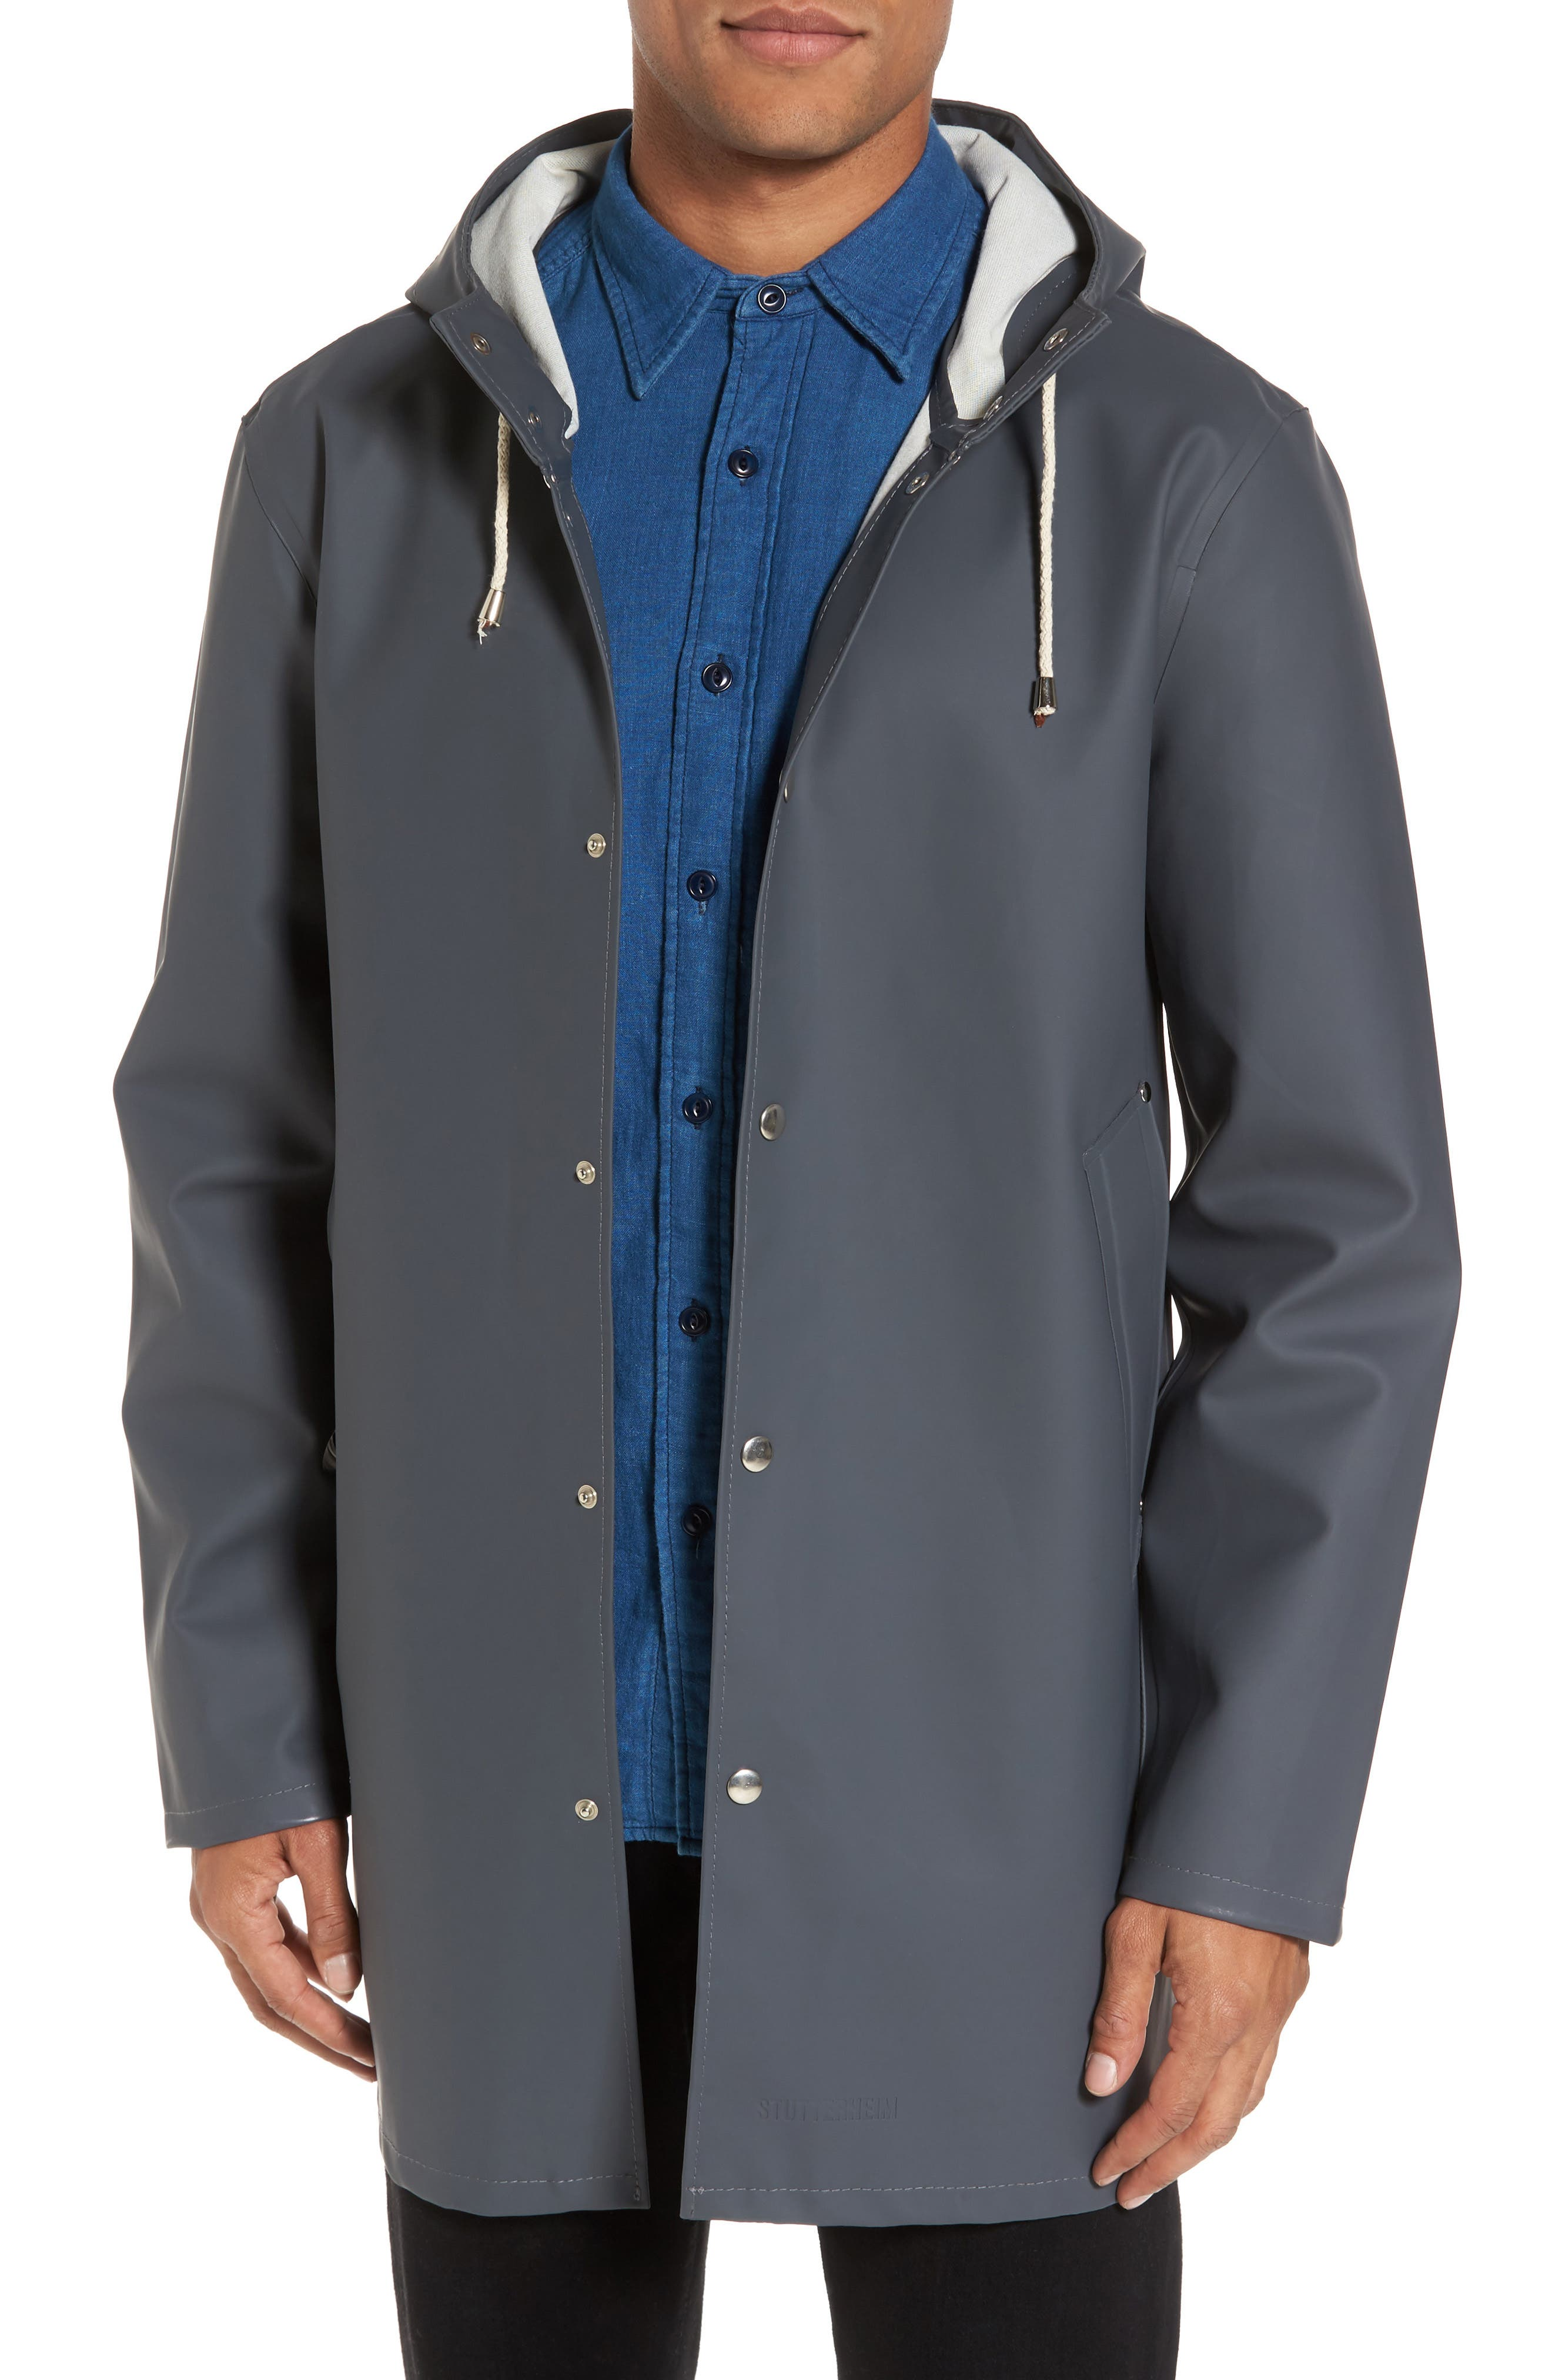 Stockholm Waterproof Hooded Raincoat,                             Main thumbnail 1, color,                             CHARCOAL